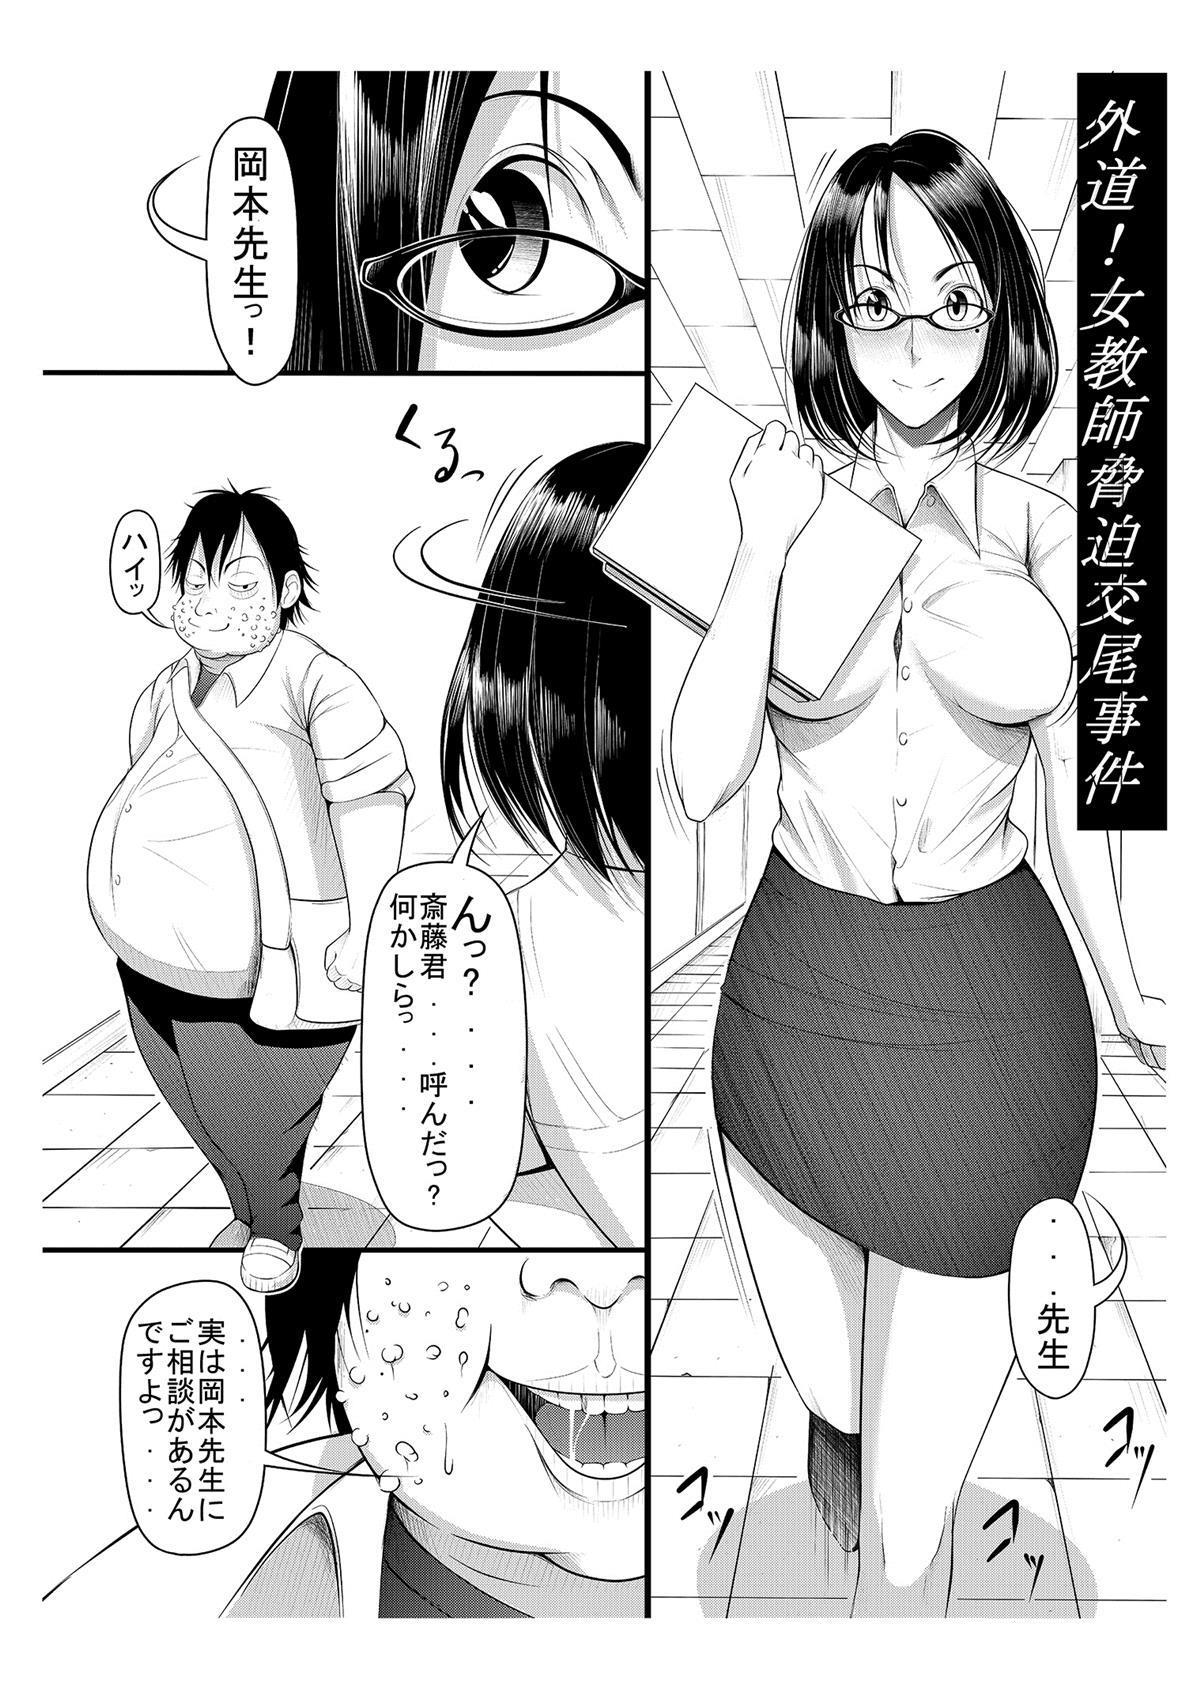 [SOENO] 外道!女教師脅迫交尾事件 (1)